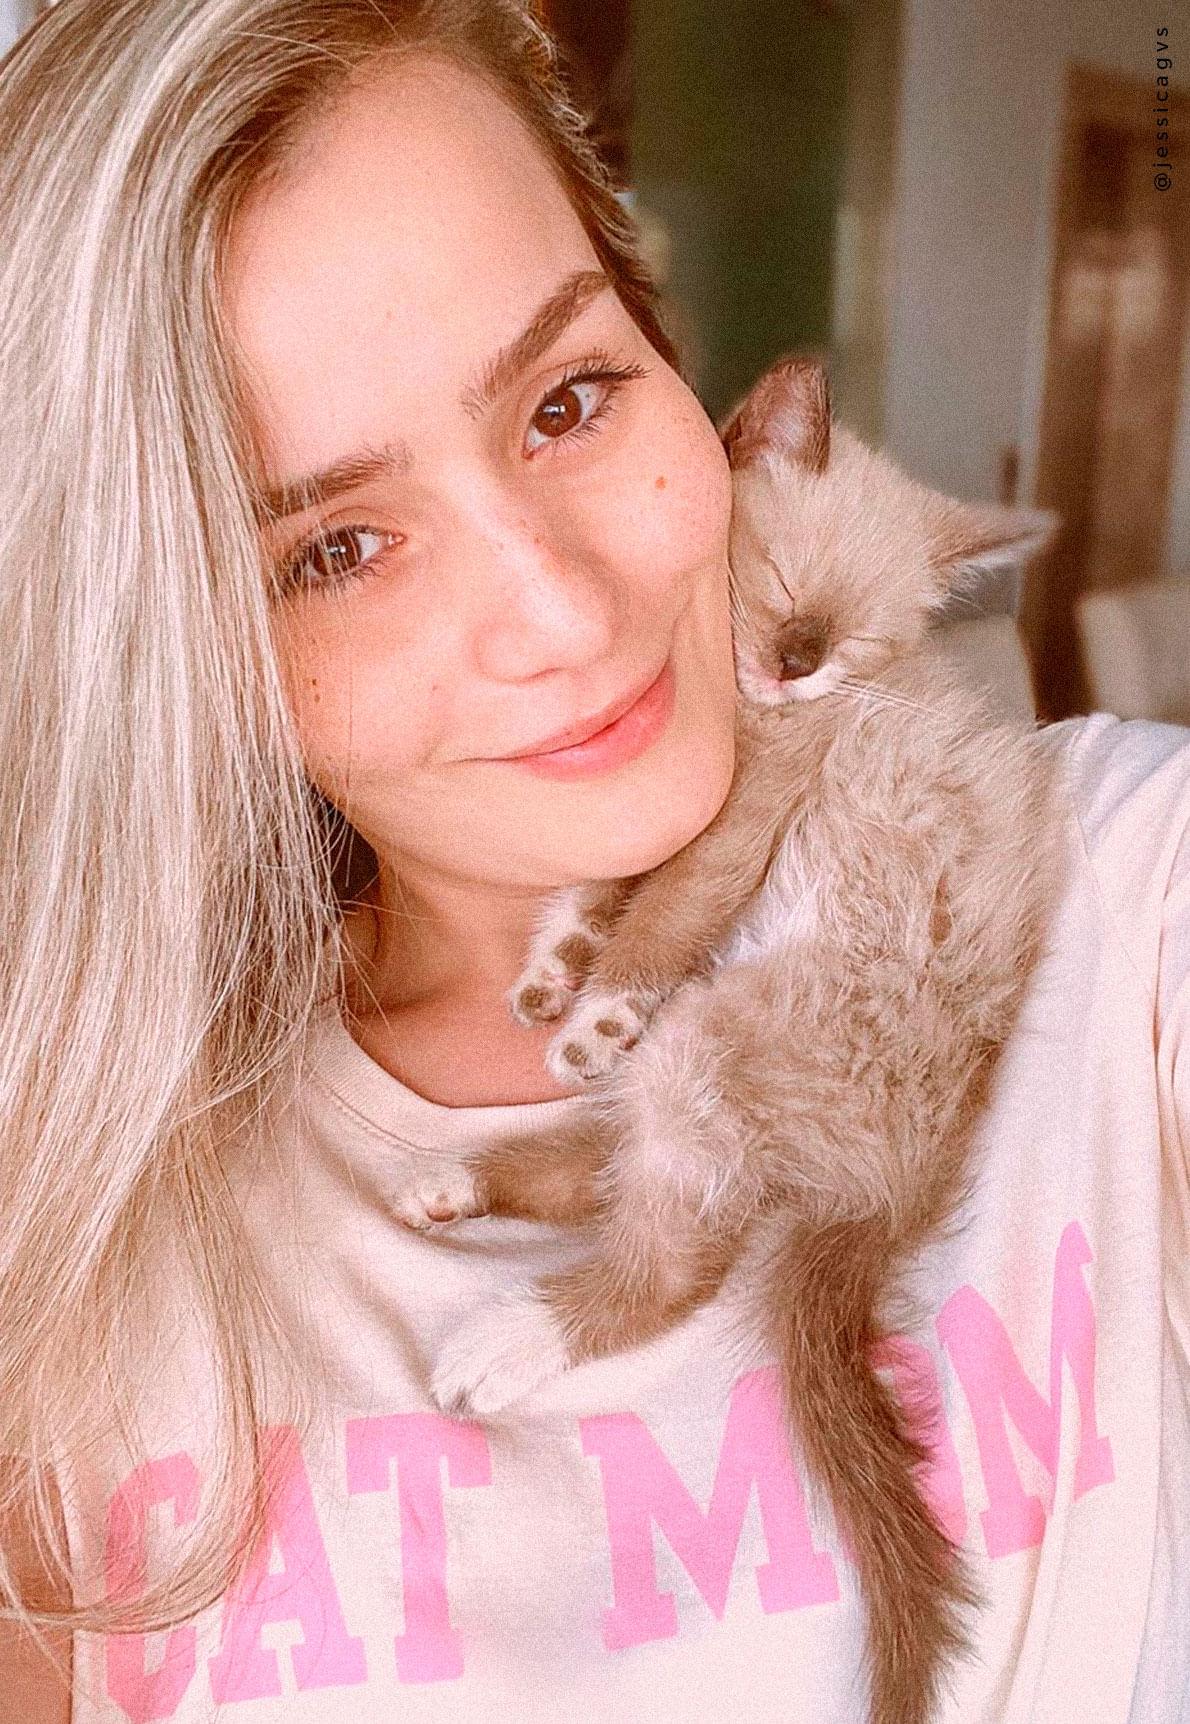 31474-tee-cat-mom-09